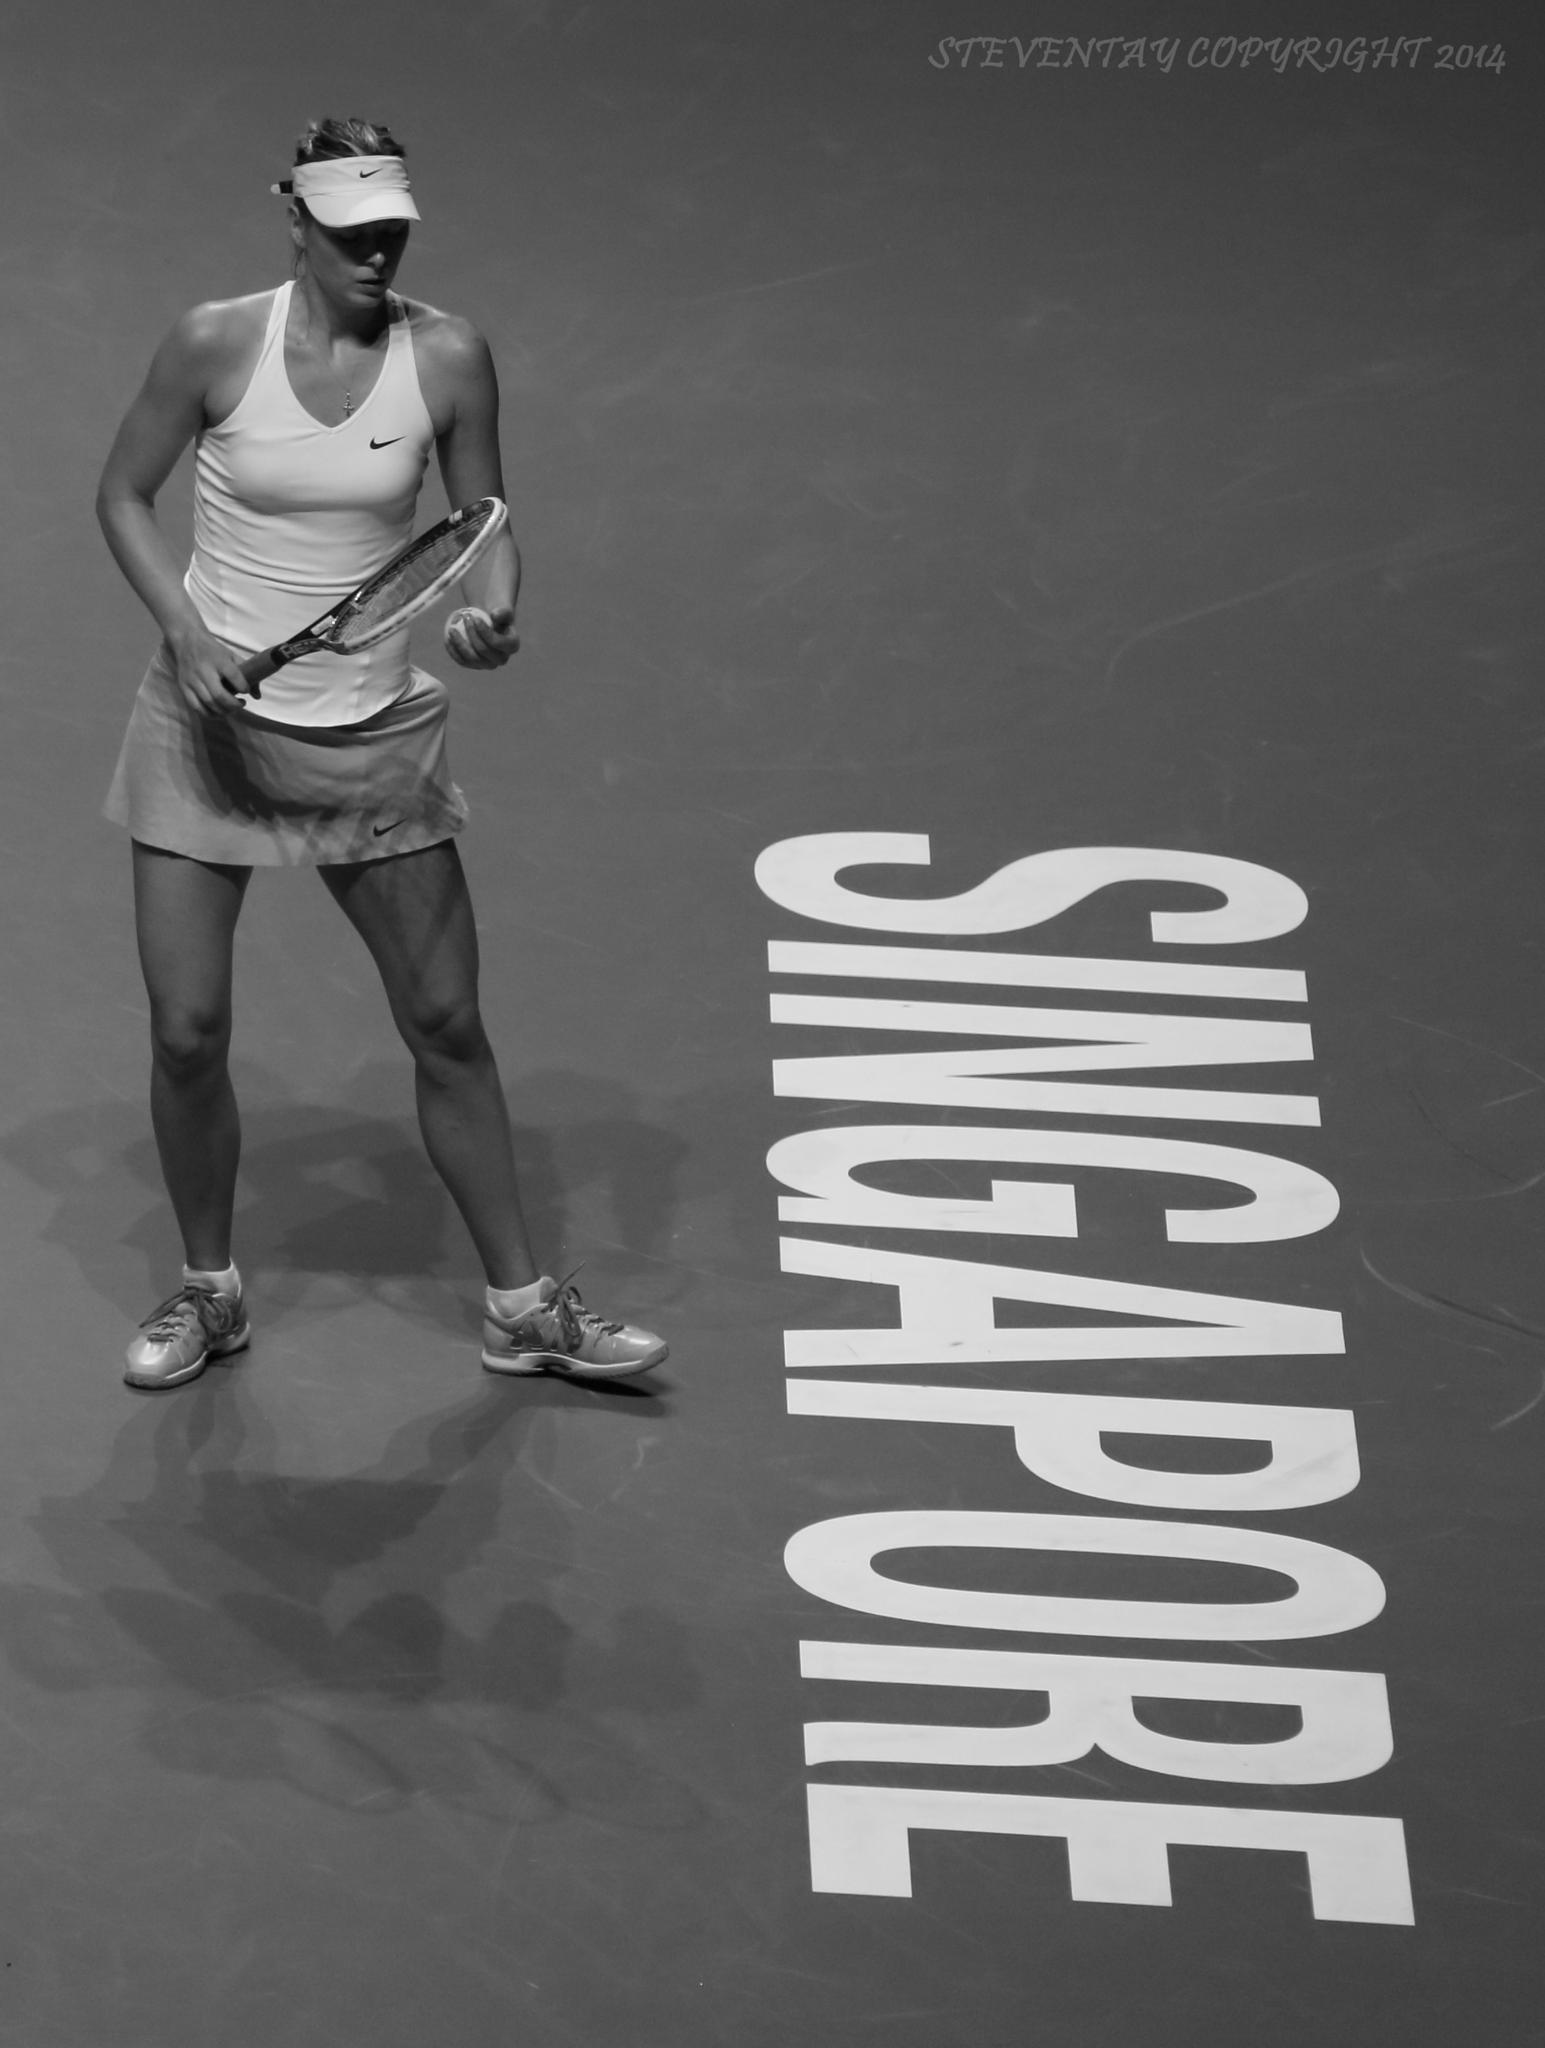 Maria Sharapova. Contemplation. by steven.tay.74